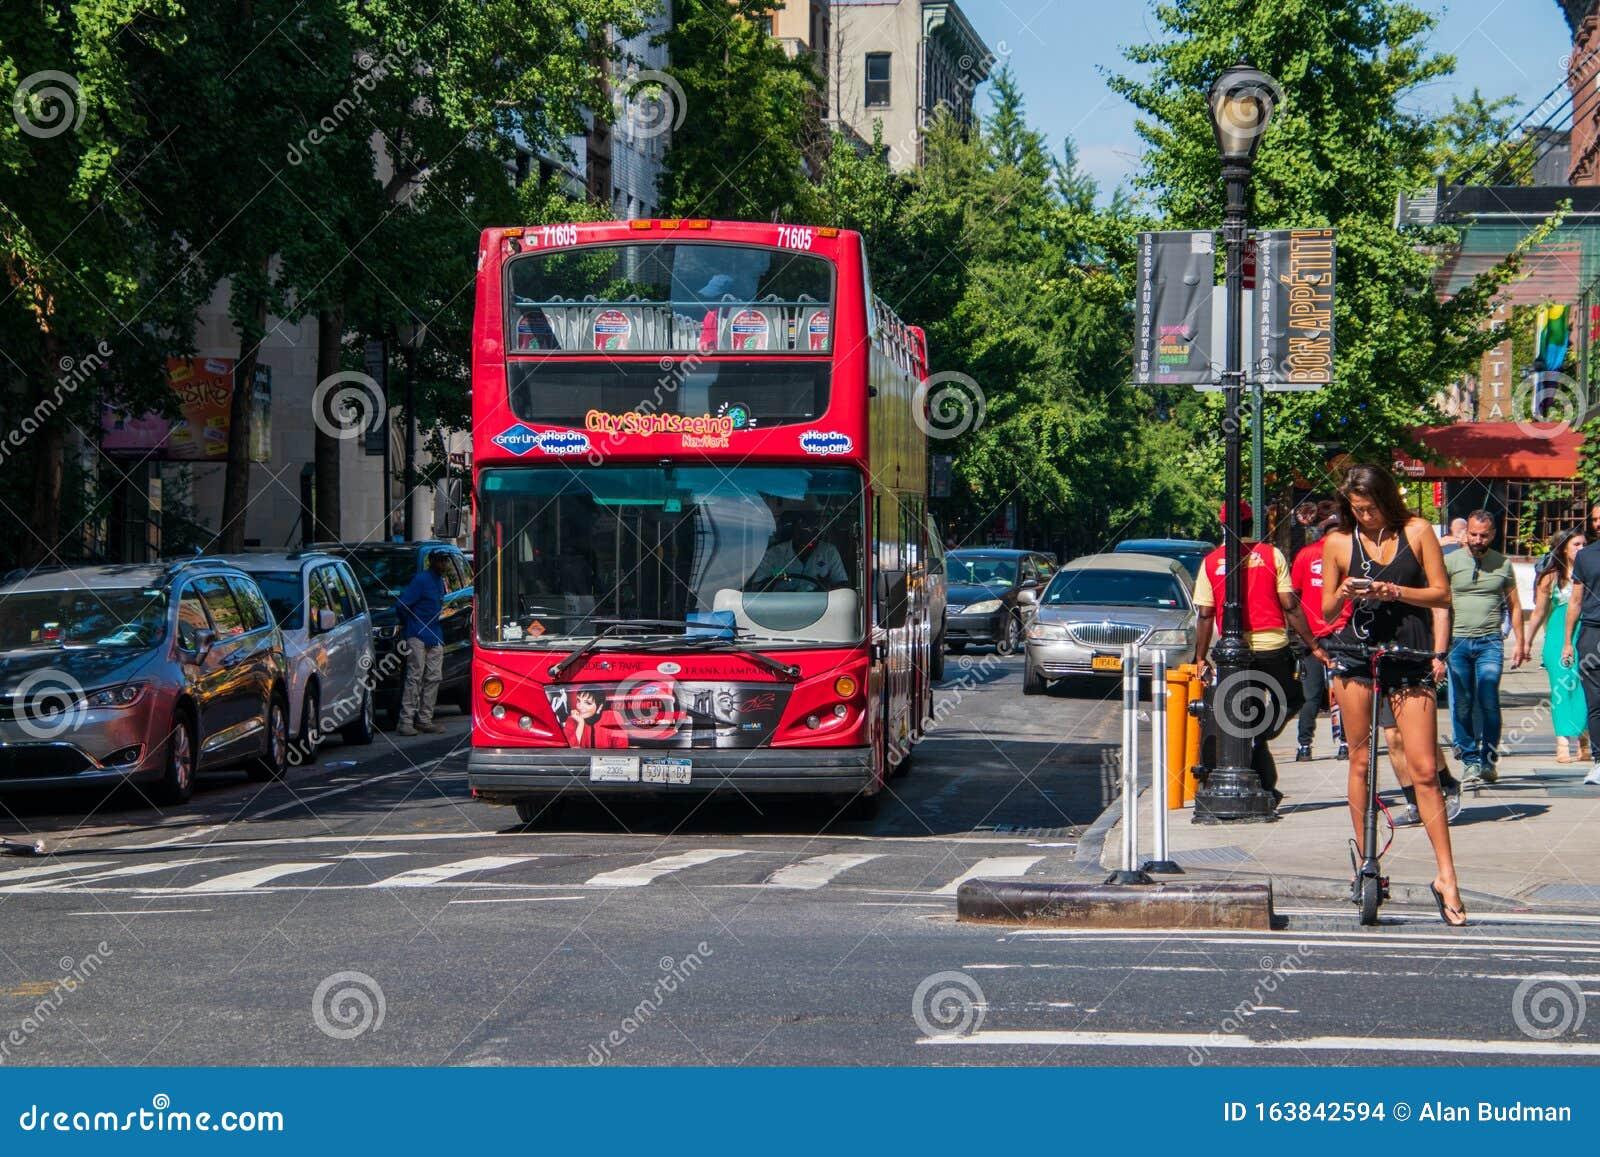 red double decker new york city hop on hop off tour bus